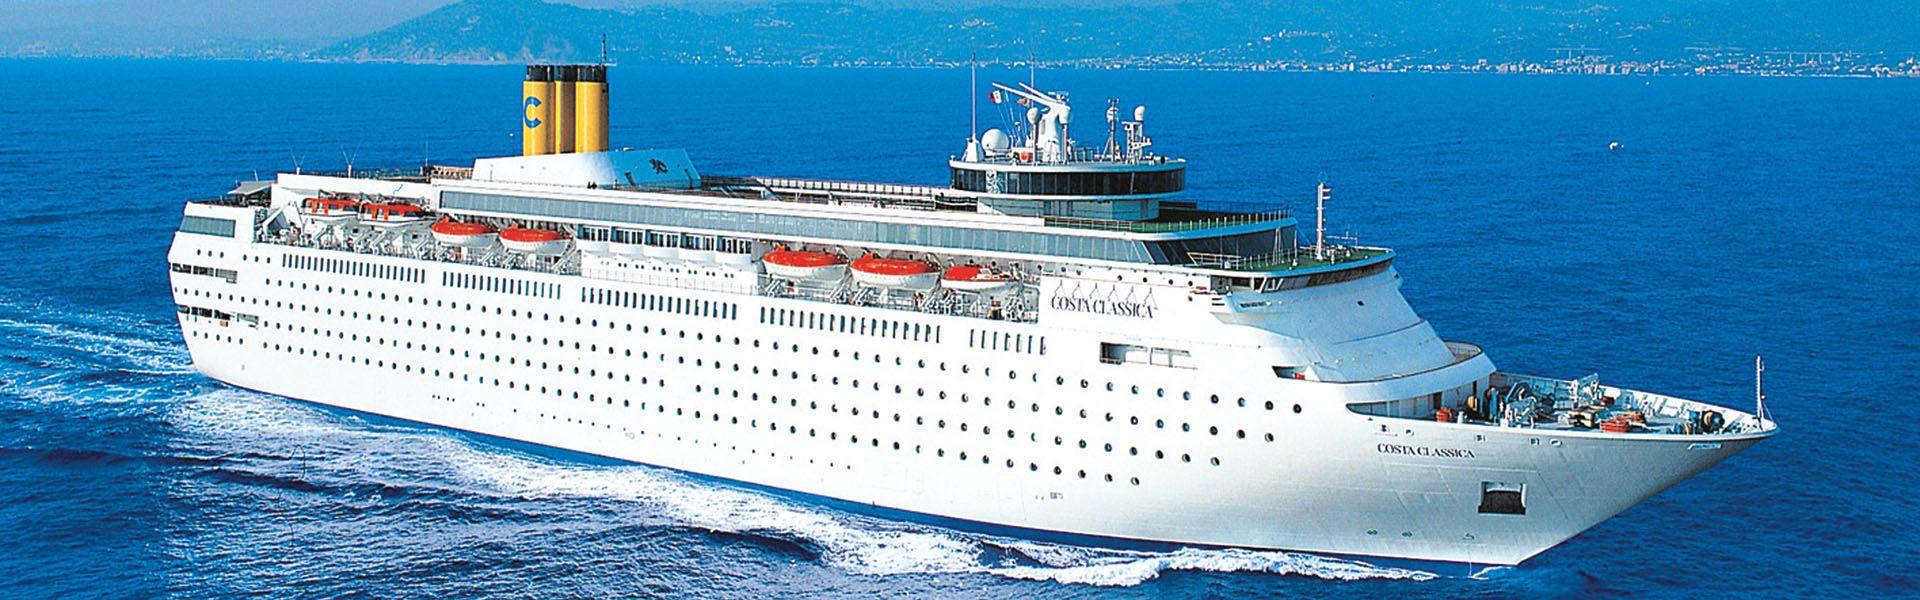 Croaziera 2017 - Oceanul Indian (Bombay) - Costa Cruises - Costa neoClasica - 14 nopti